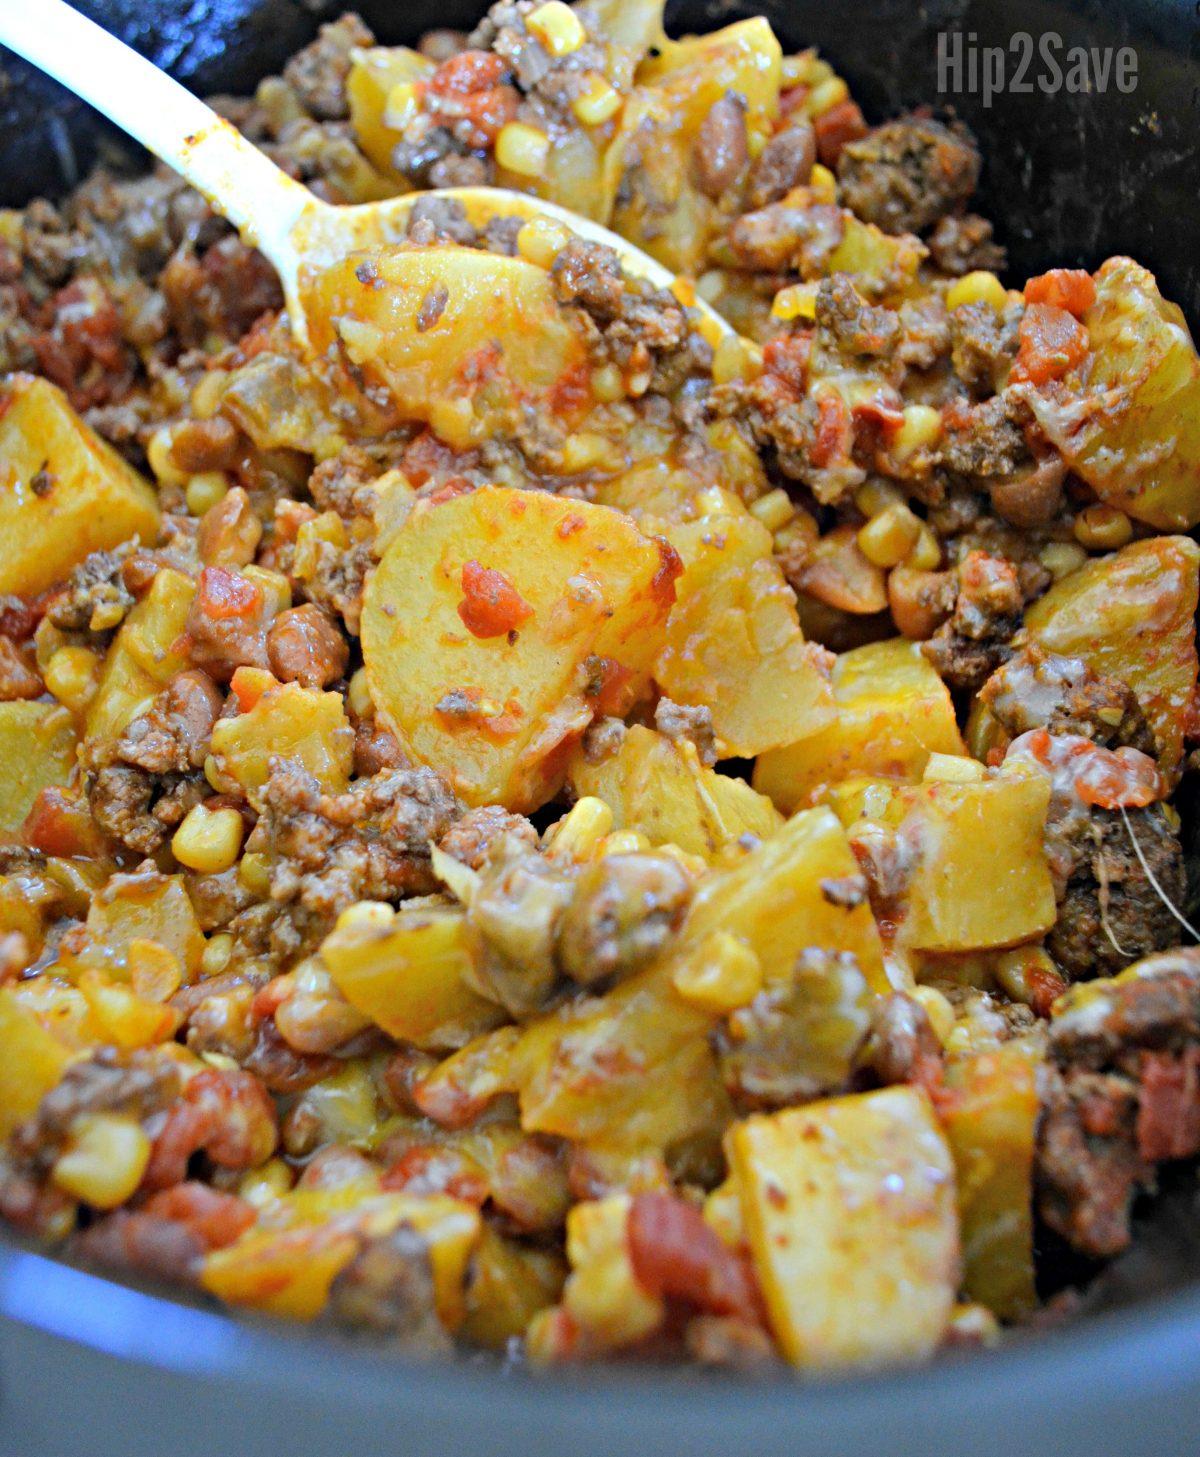 Easy Crock-Pot Weeknight Meal Idea | Cowboy Supper